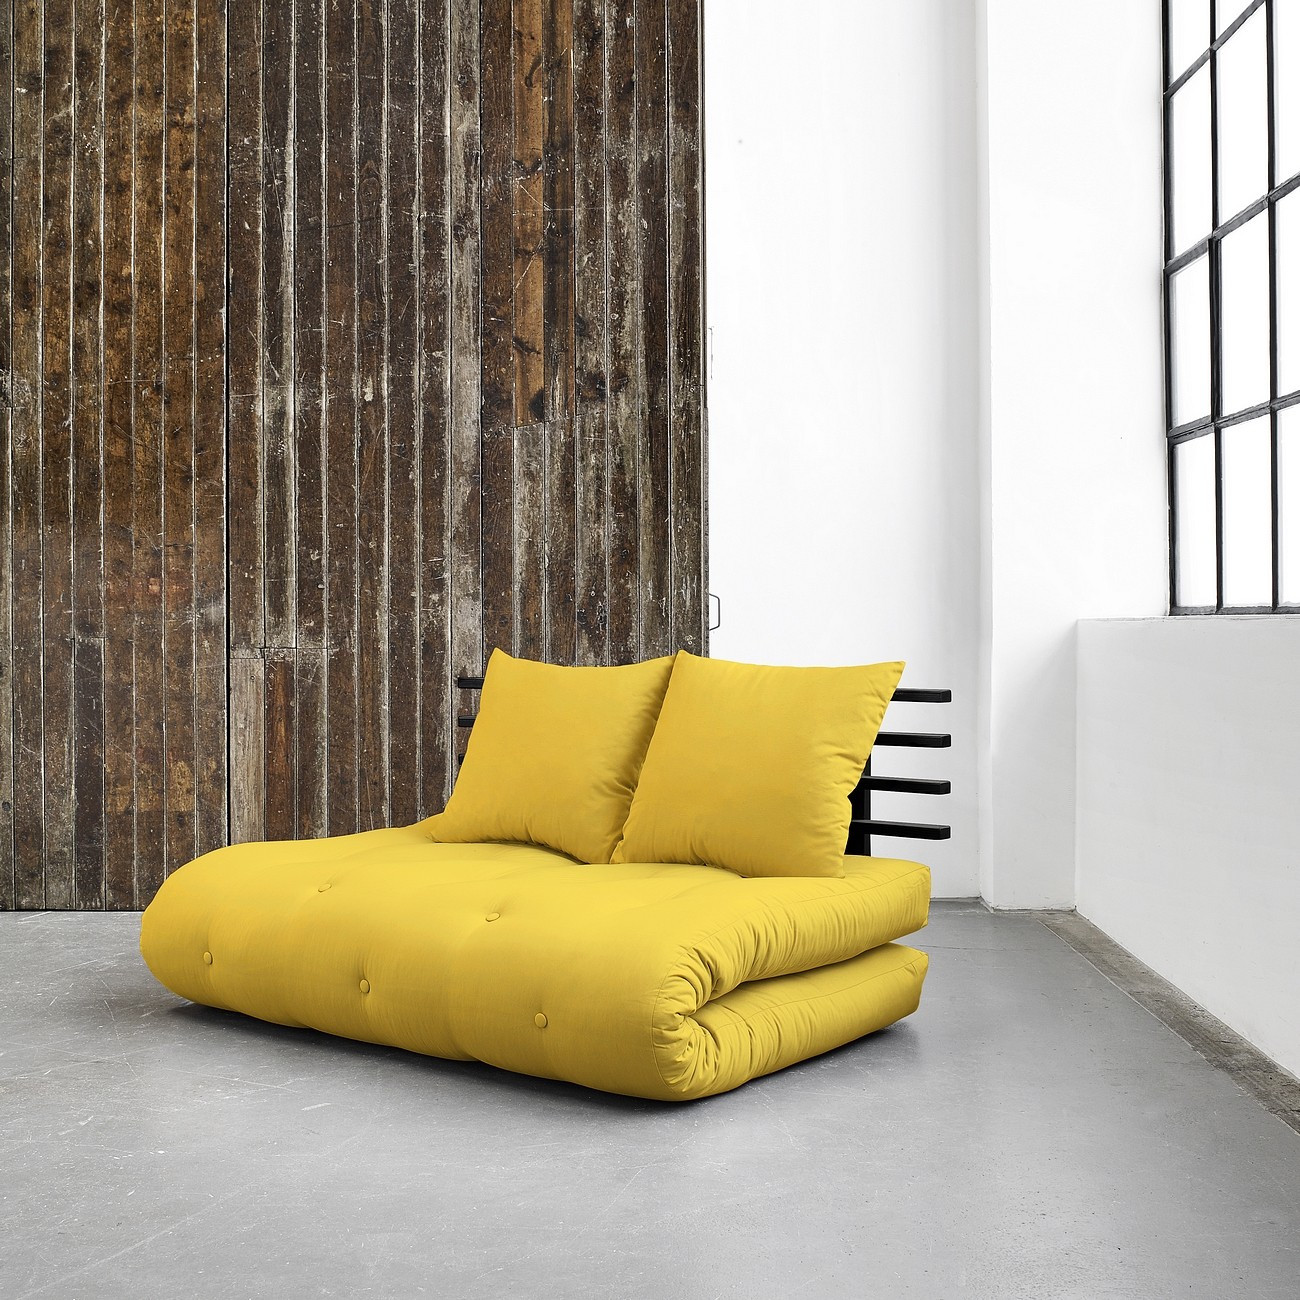 Желтый бескаркасный диван